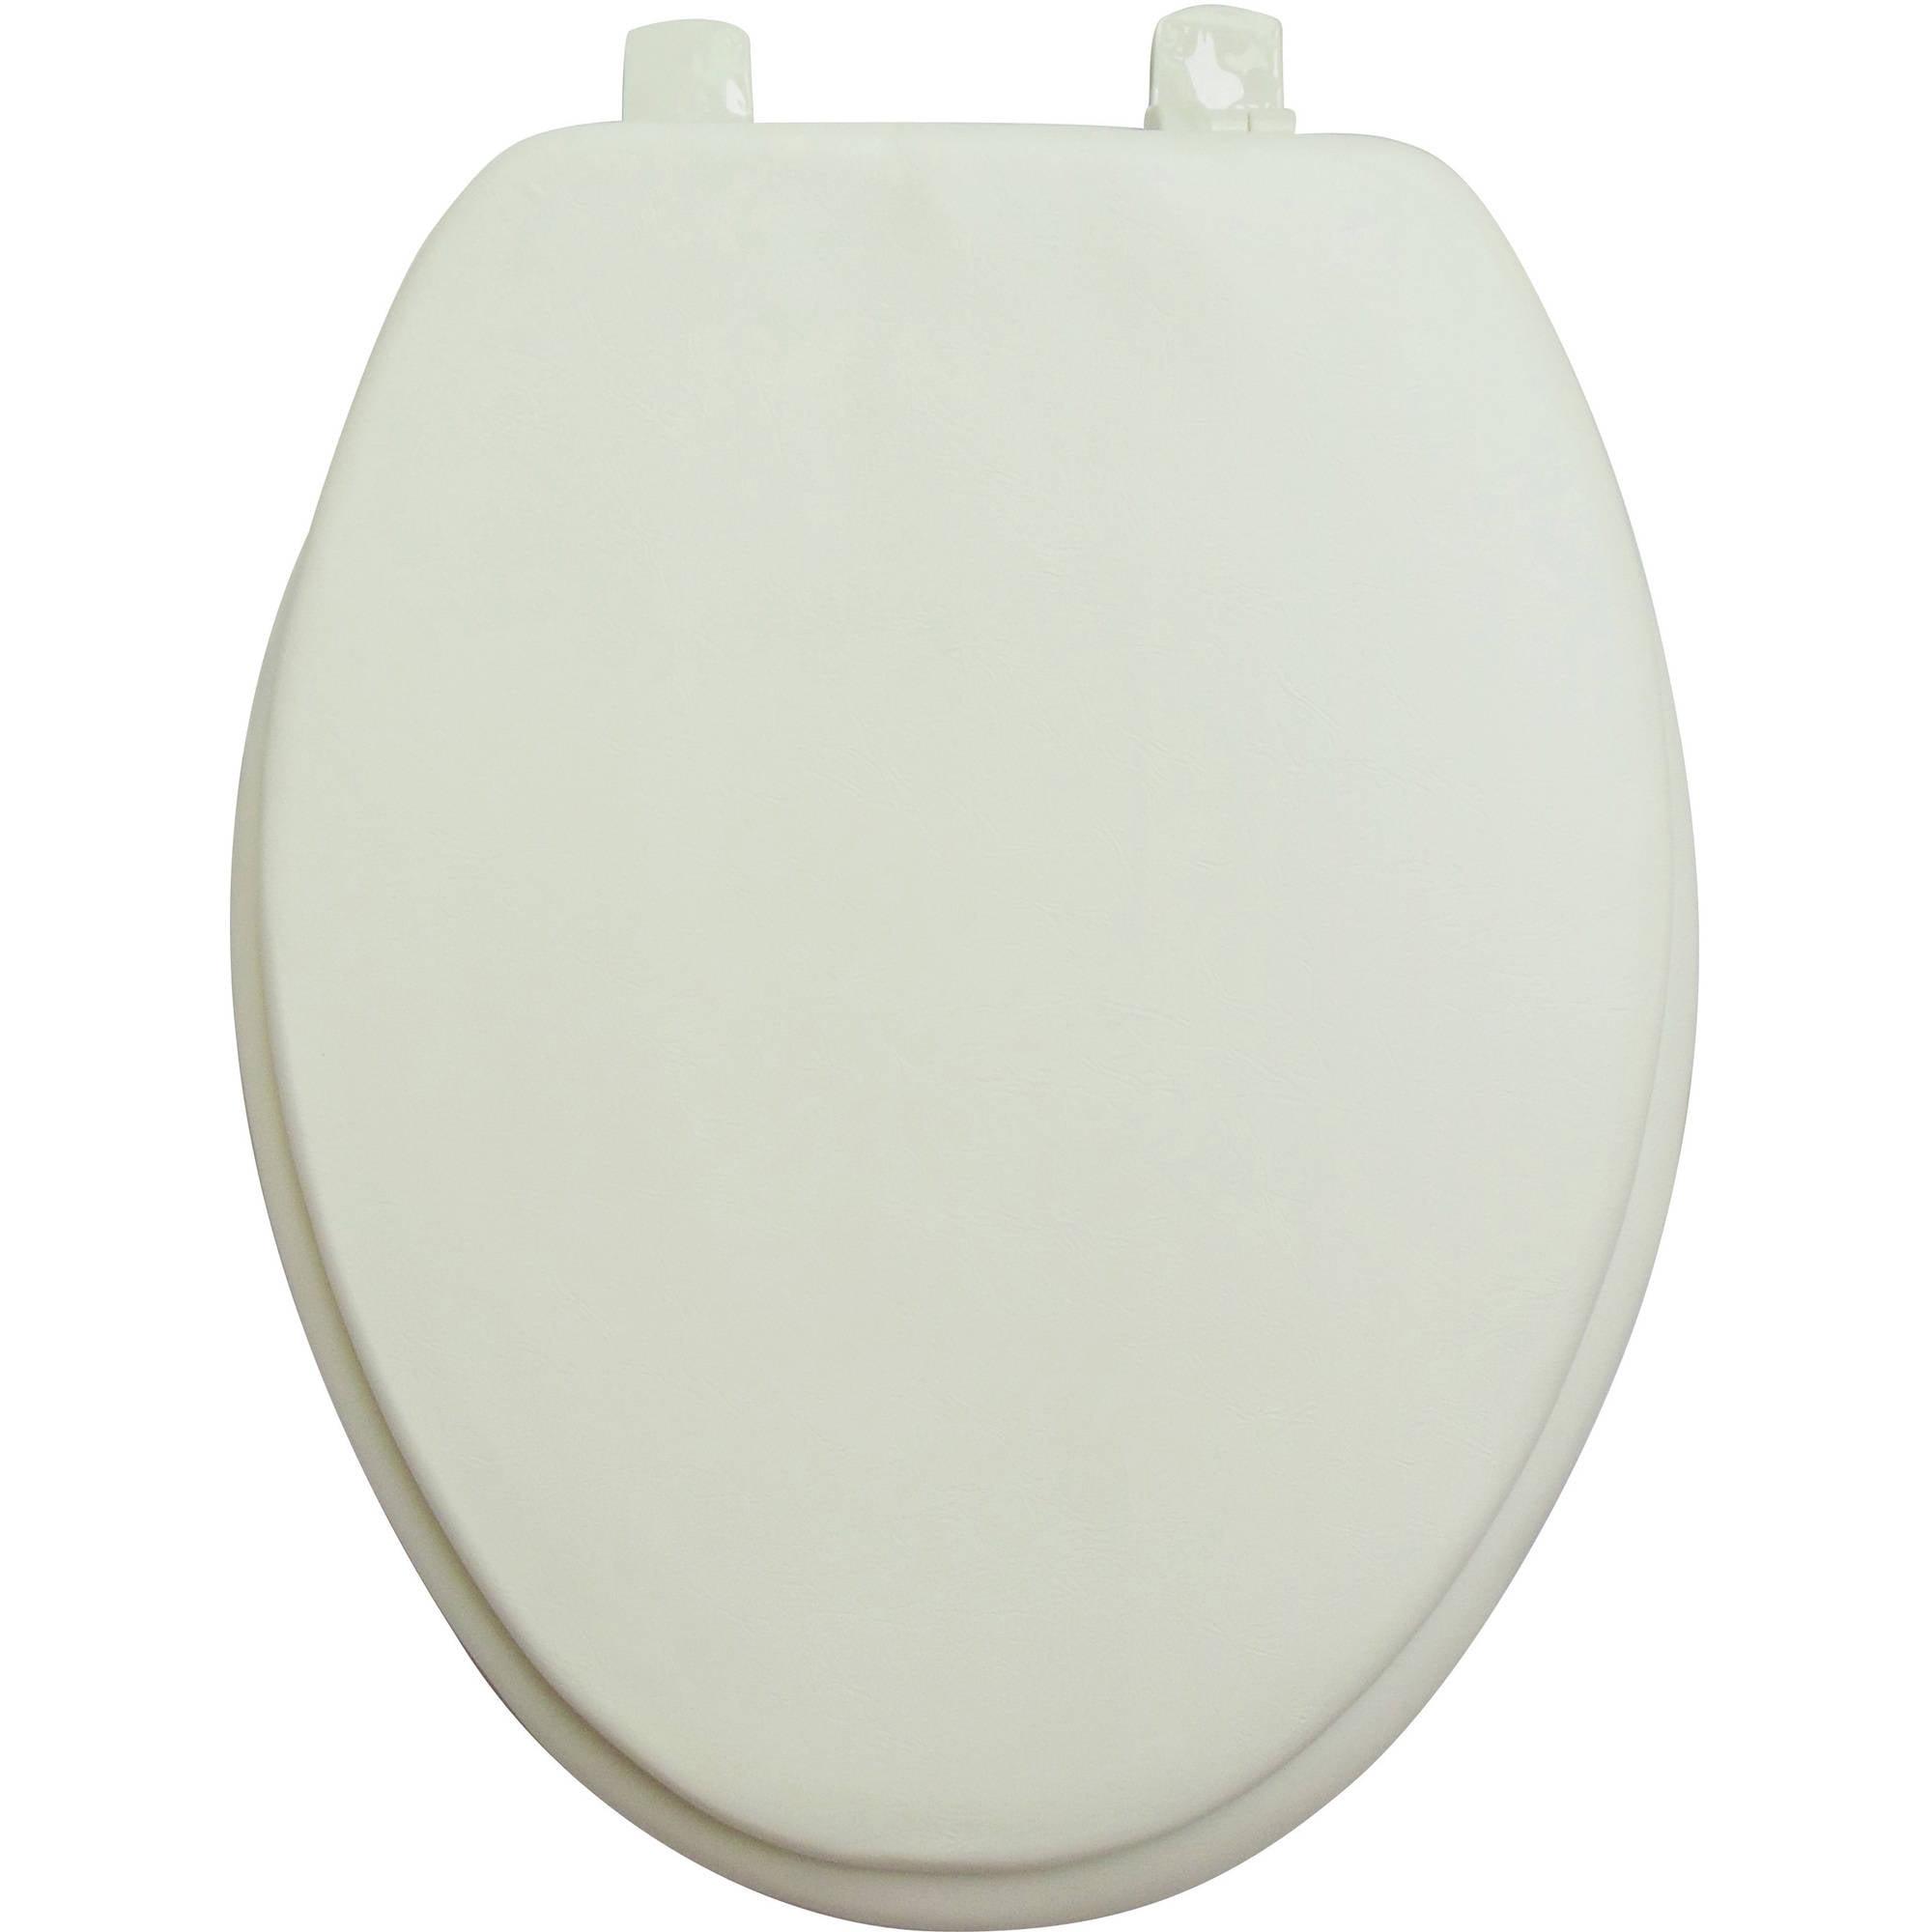 19  Elongated Soft Toilet SeatCushioned Toilet Seat   Walmart com. Toilet Seat 17 X 14. Home Design Ideas